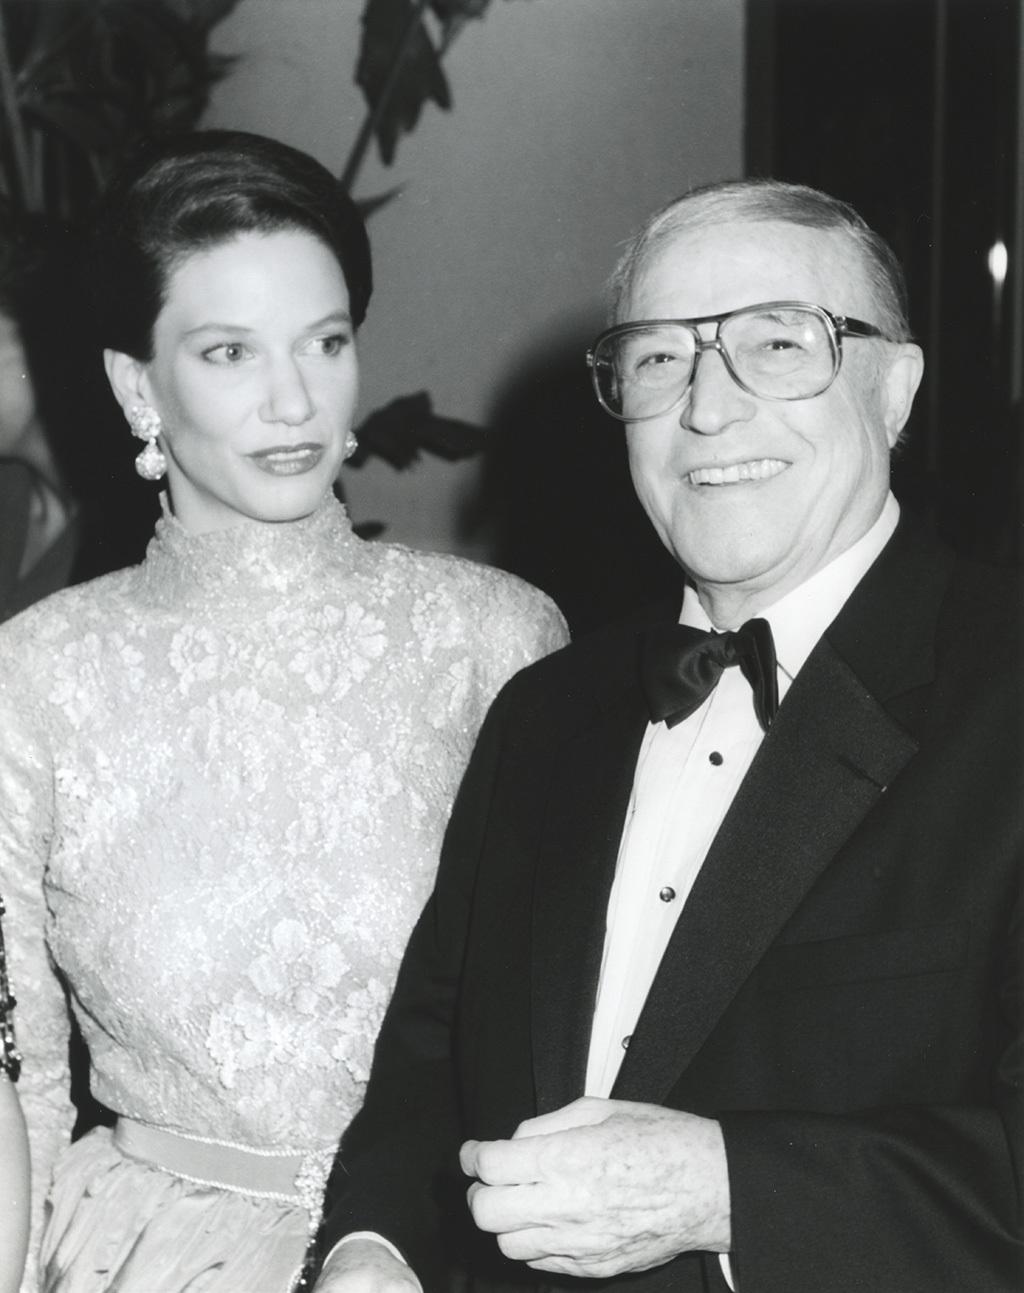 Gene Kelly and Patricia Kelly